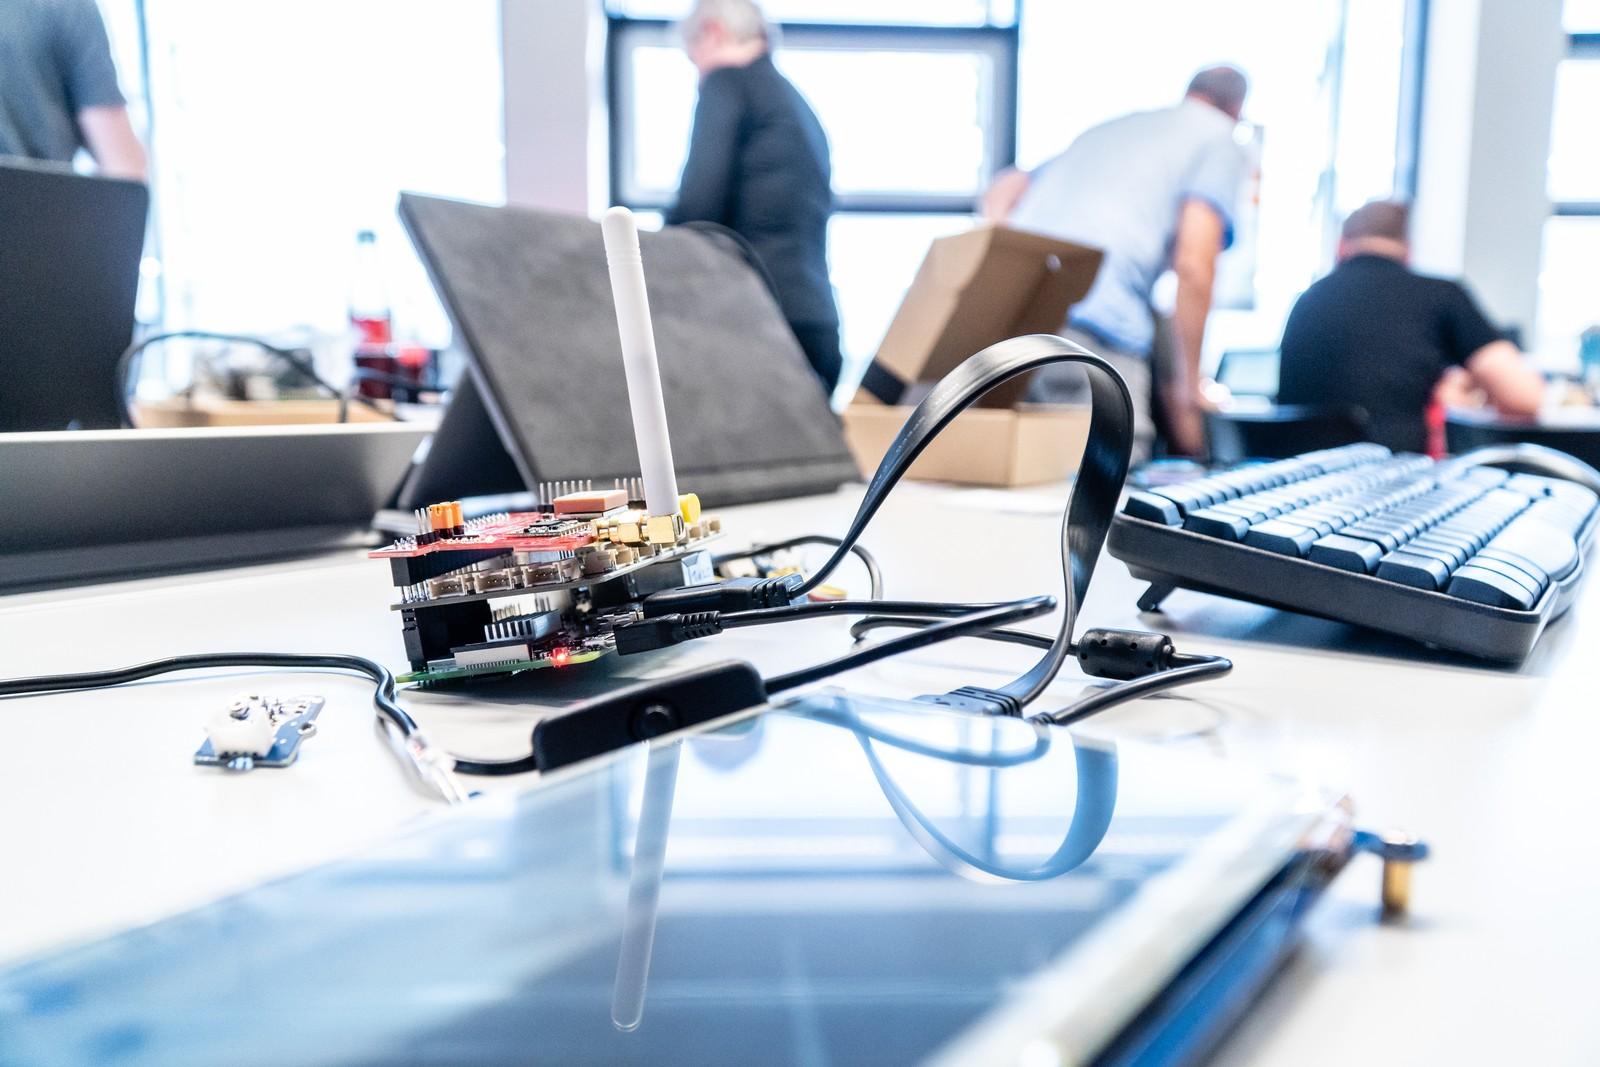 hackathon diese handwerker erobern das internet der dinge. Black Bedroom Furniture Sets. Home Design Ideas